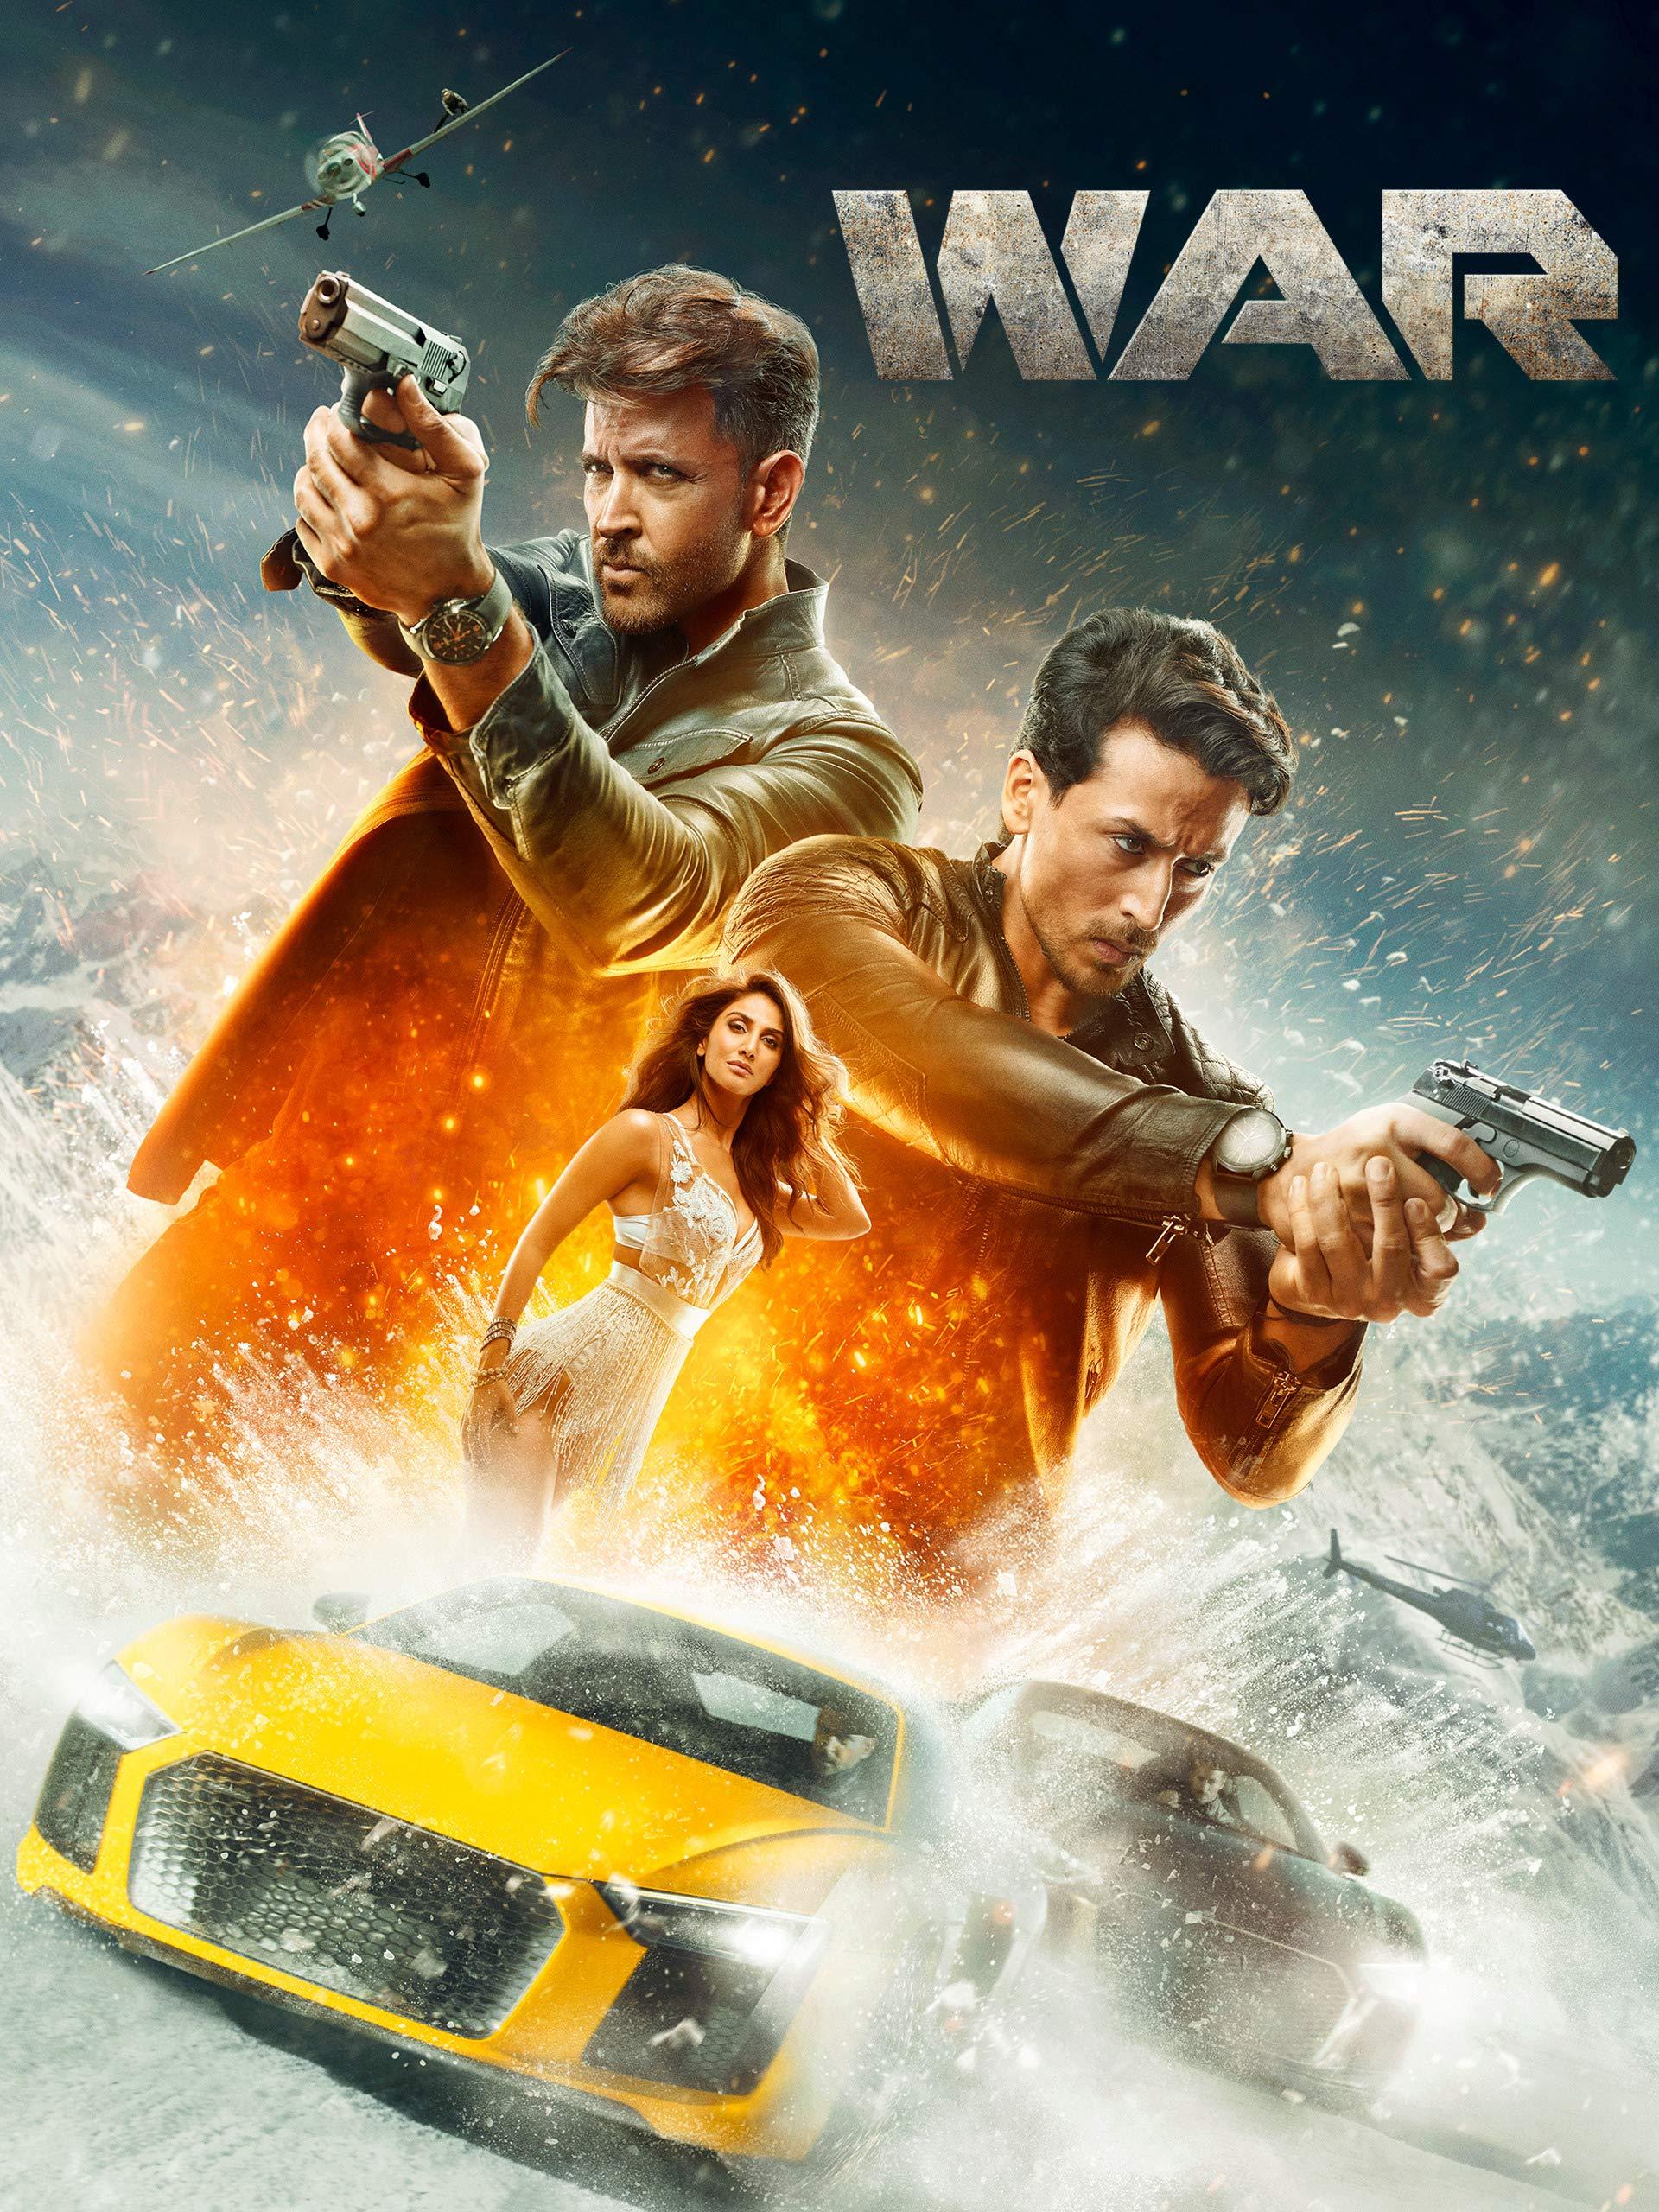 War (2019) BluRay 1080p 10bit HEVC Hindi DD 5.1 H265 ESubs ~RONIN~ | G- Drive | 3.41 GB |